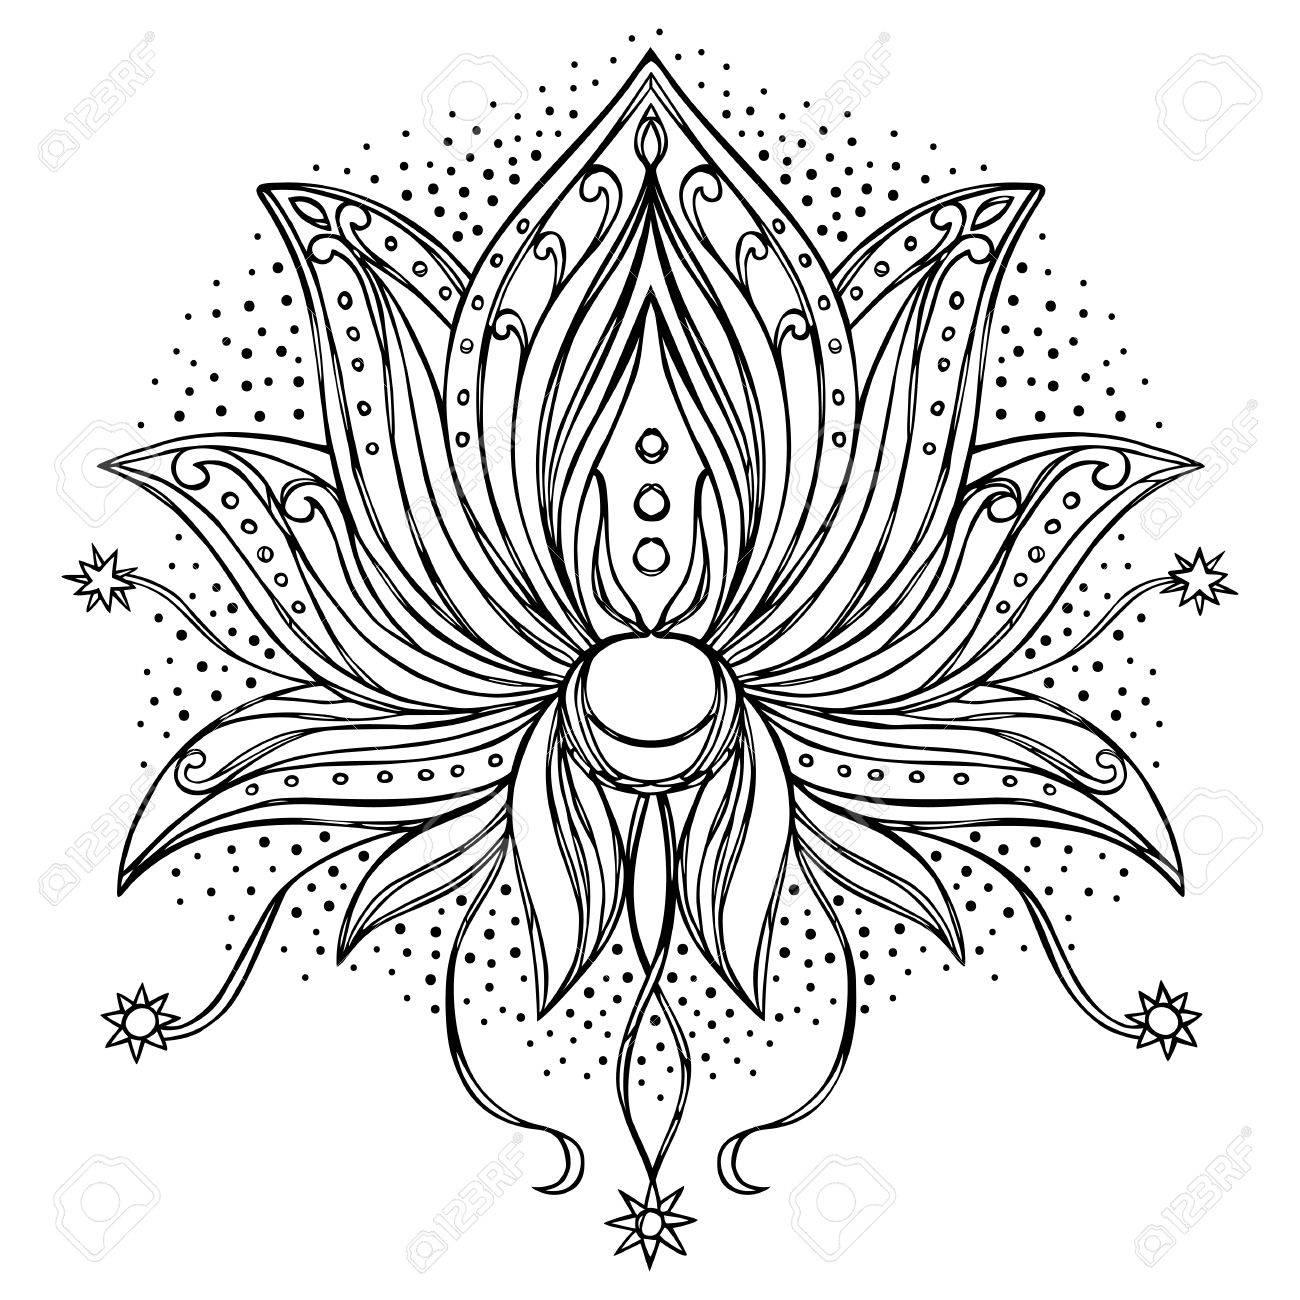 Loto. Símbolo Floral De Amuletos, Impresiones Textiles, Tatuajes ...